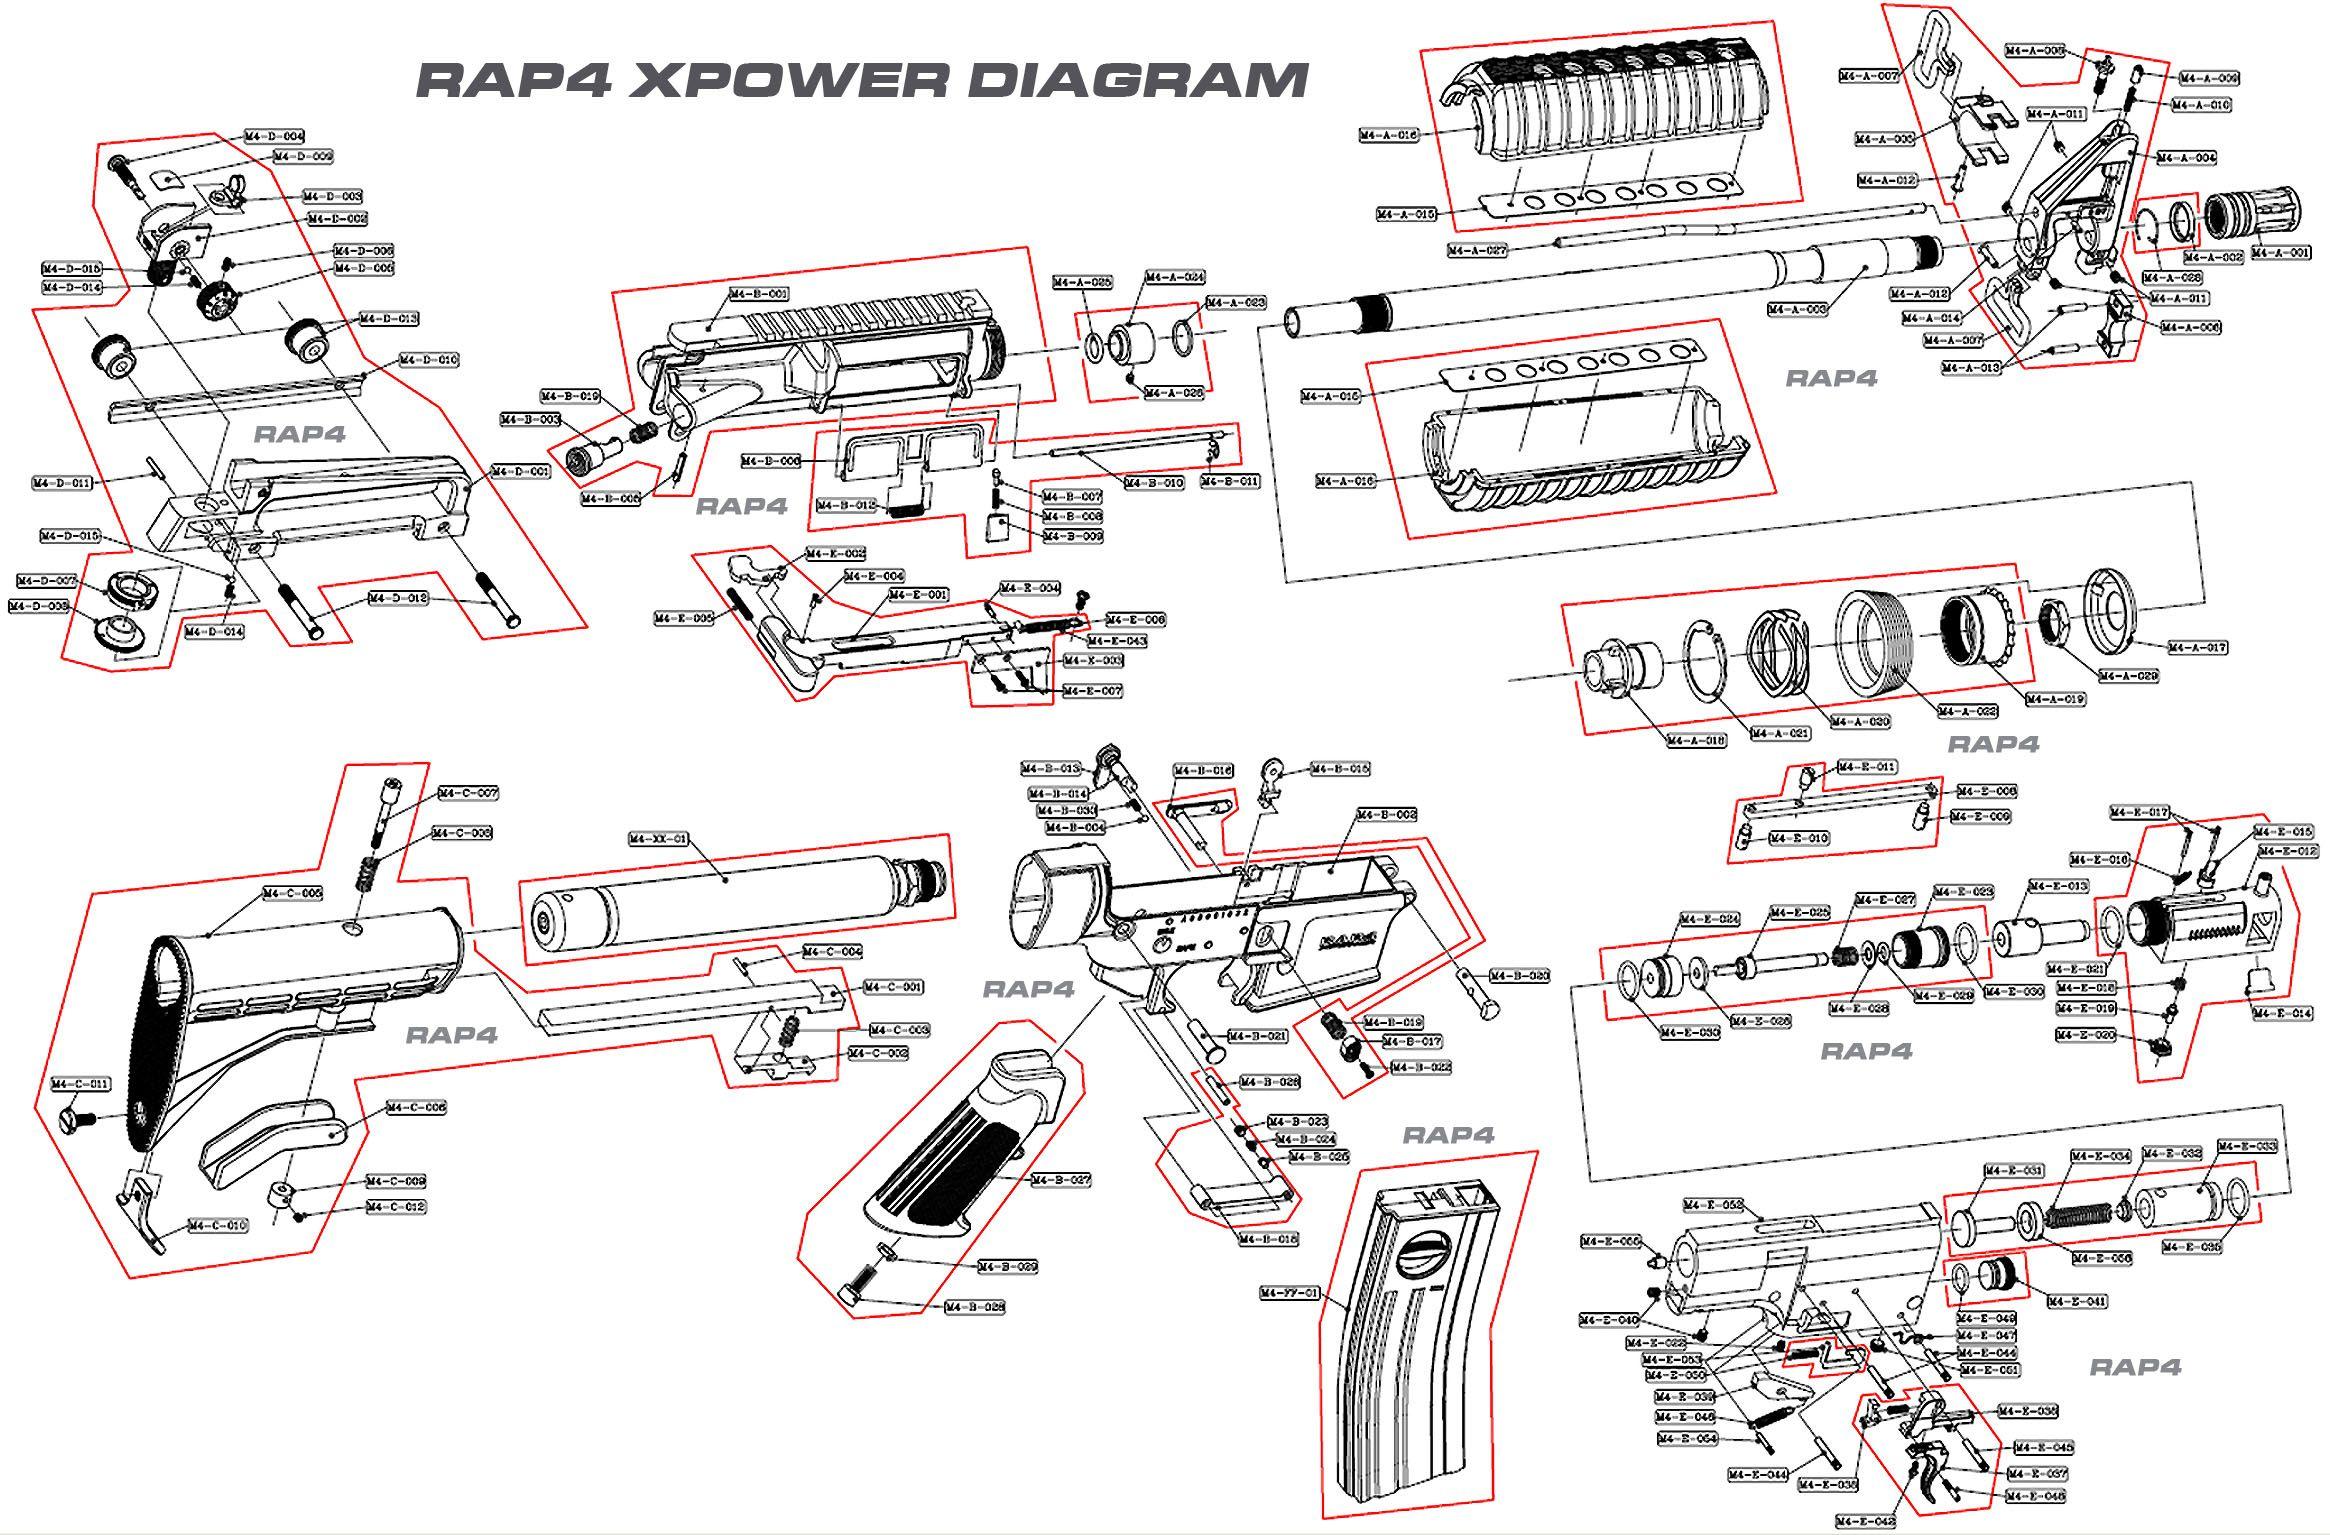 ar 15 schematic m4 carbine schematic | military | pinterest | m4 carbine ... ar 15 stock carbine parts diagram